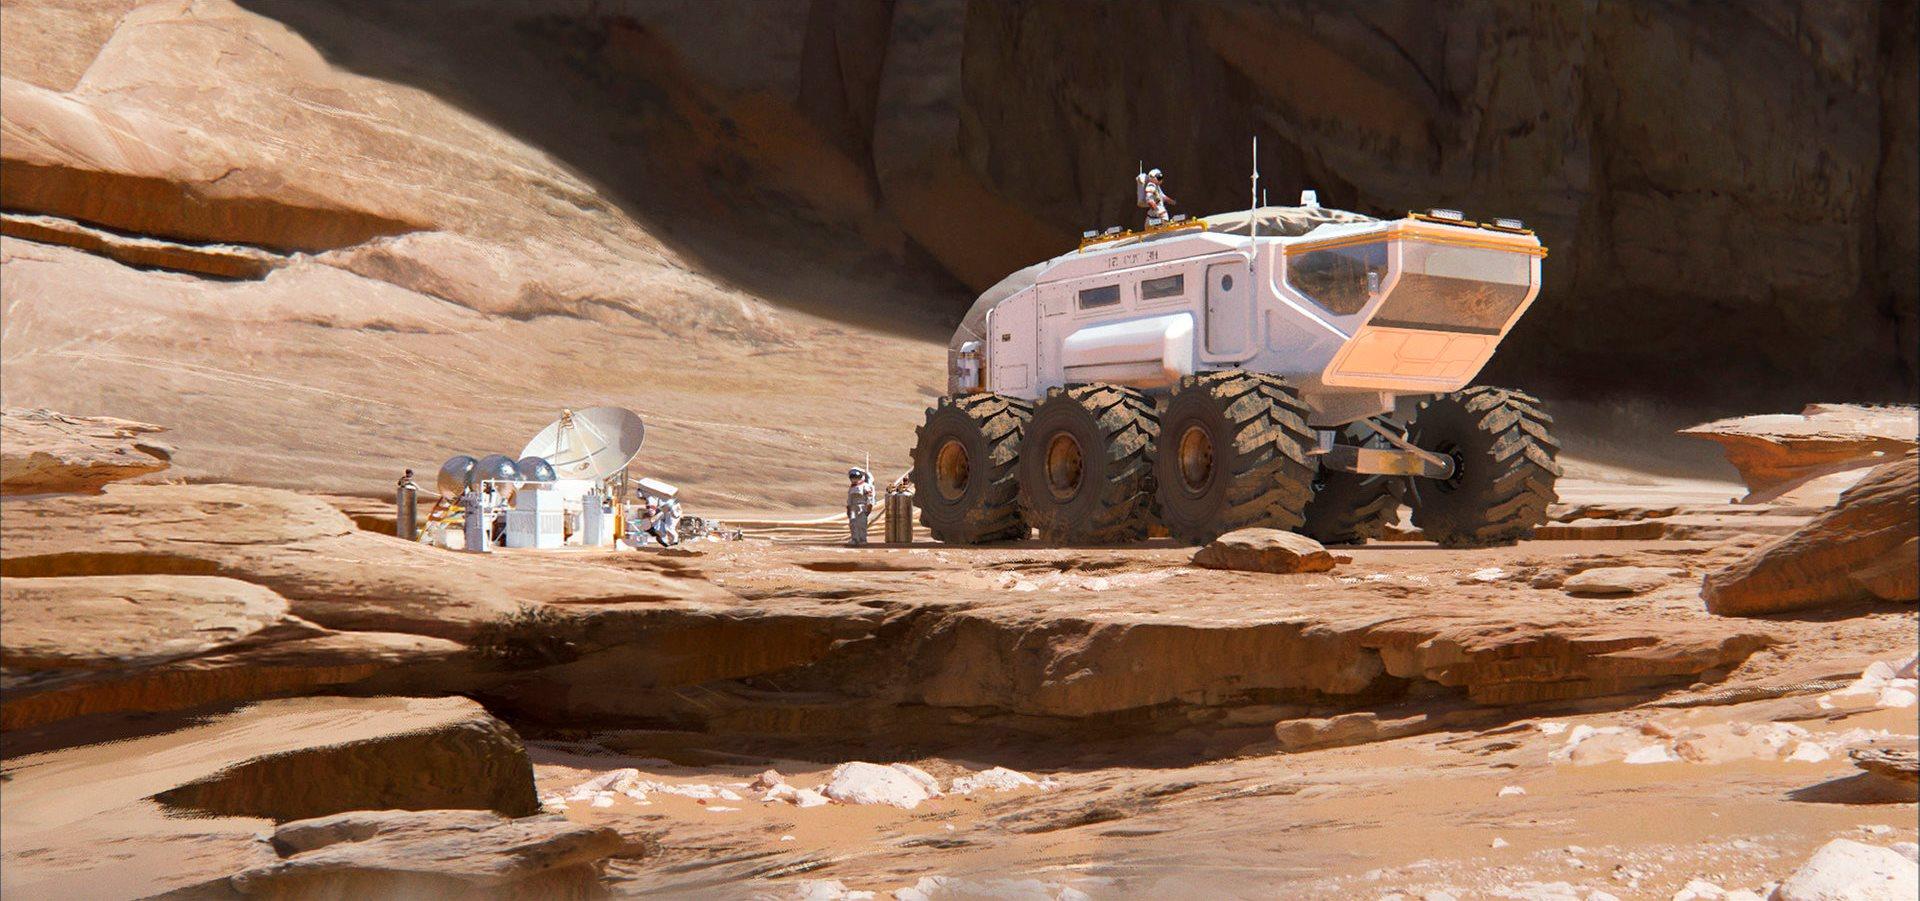 human Mars Mars rover by Florent Lebrun